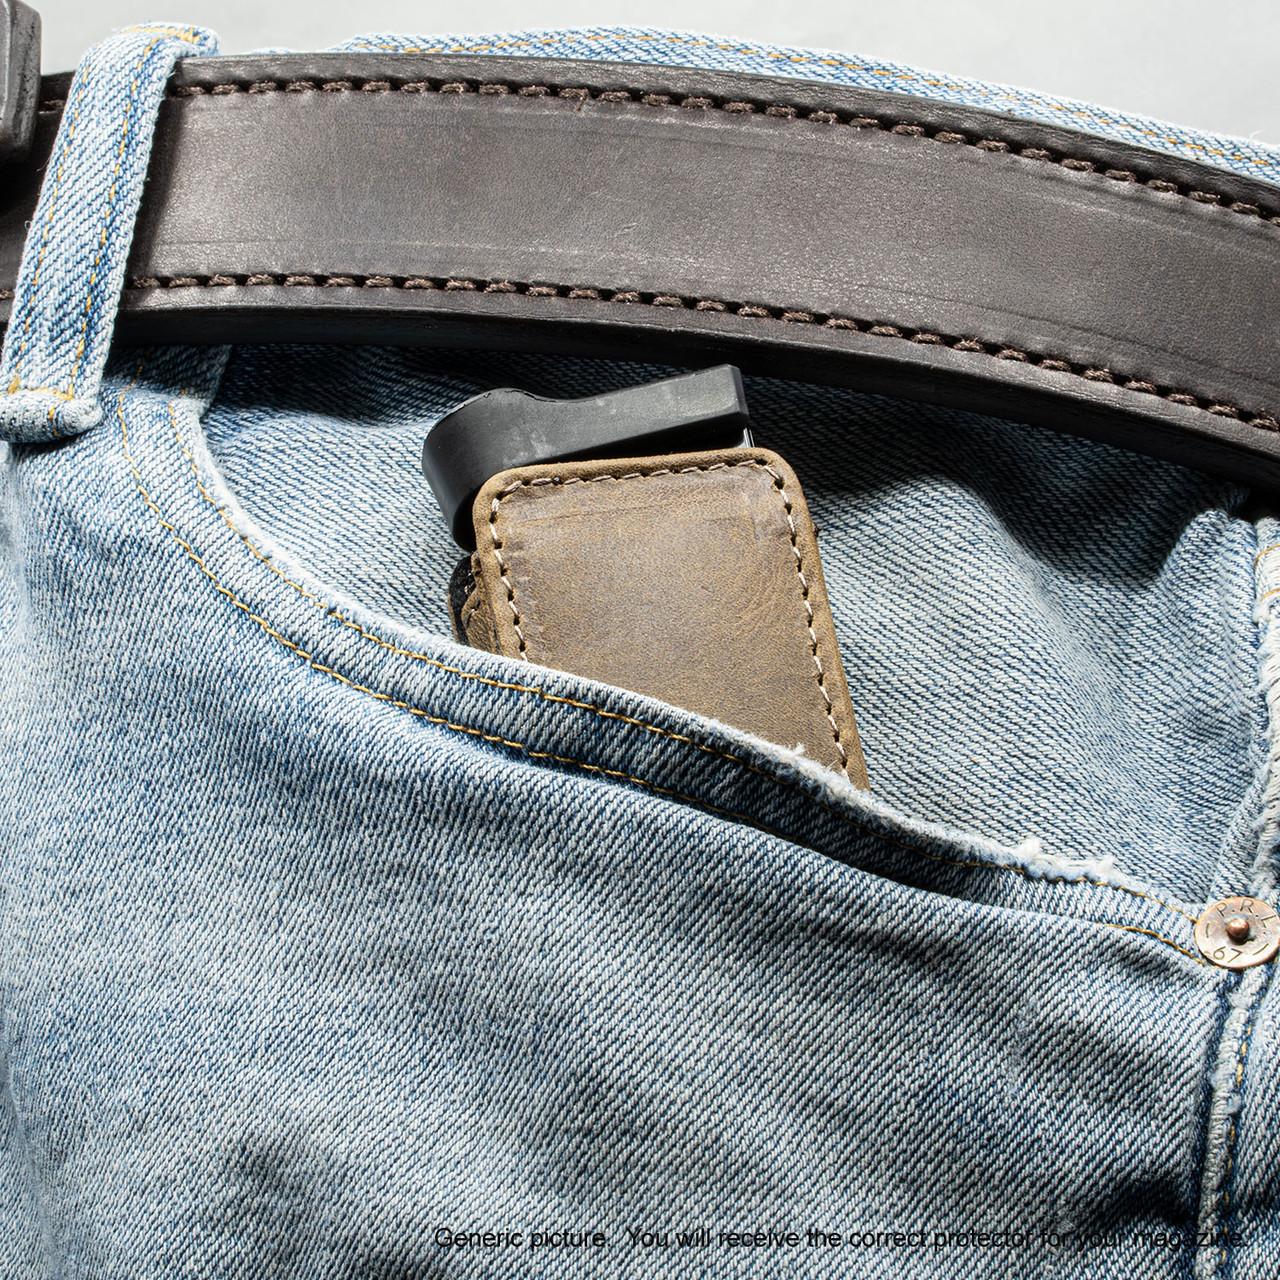 Beretta APX Brown Freedom Magazine Pocket Protector